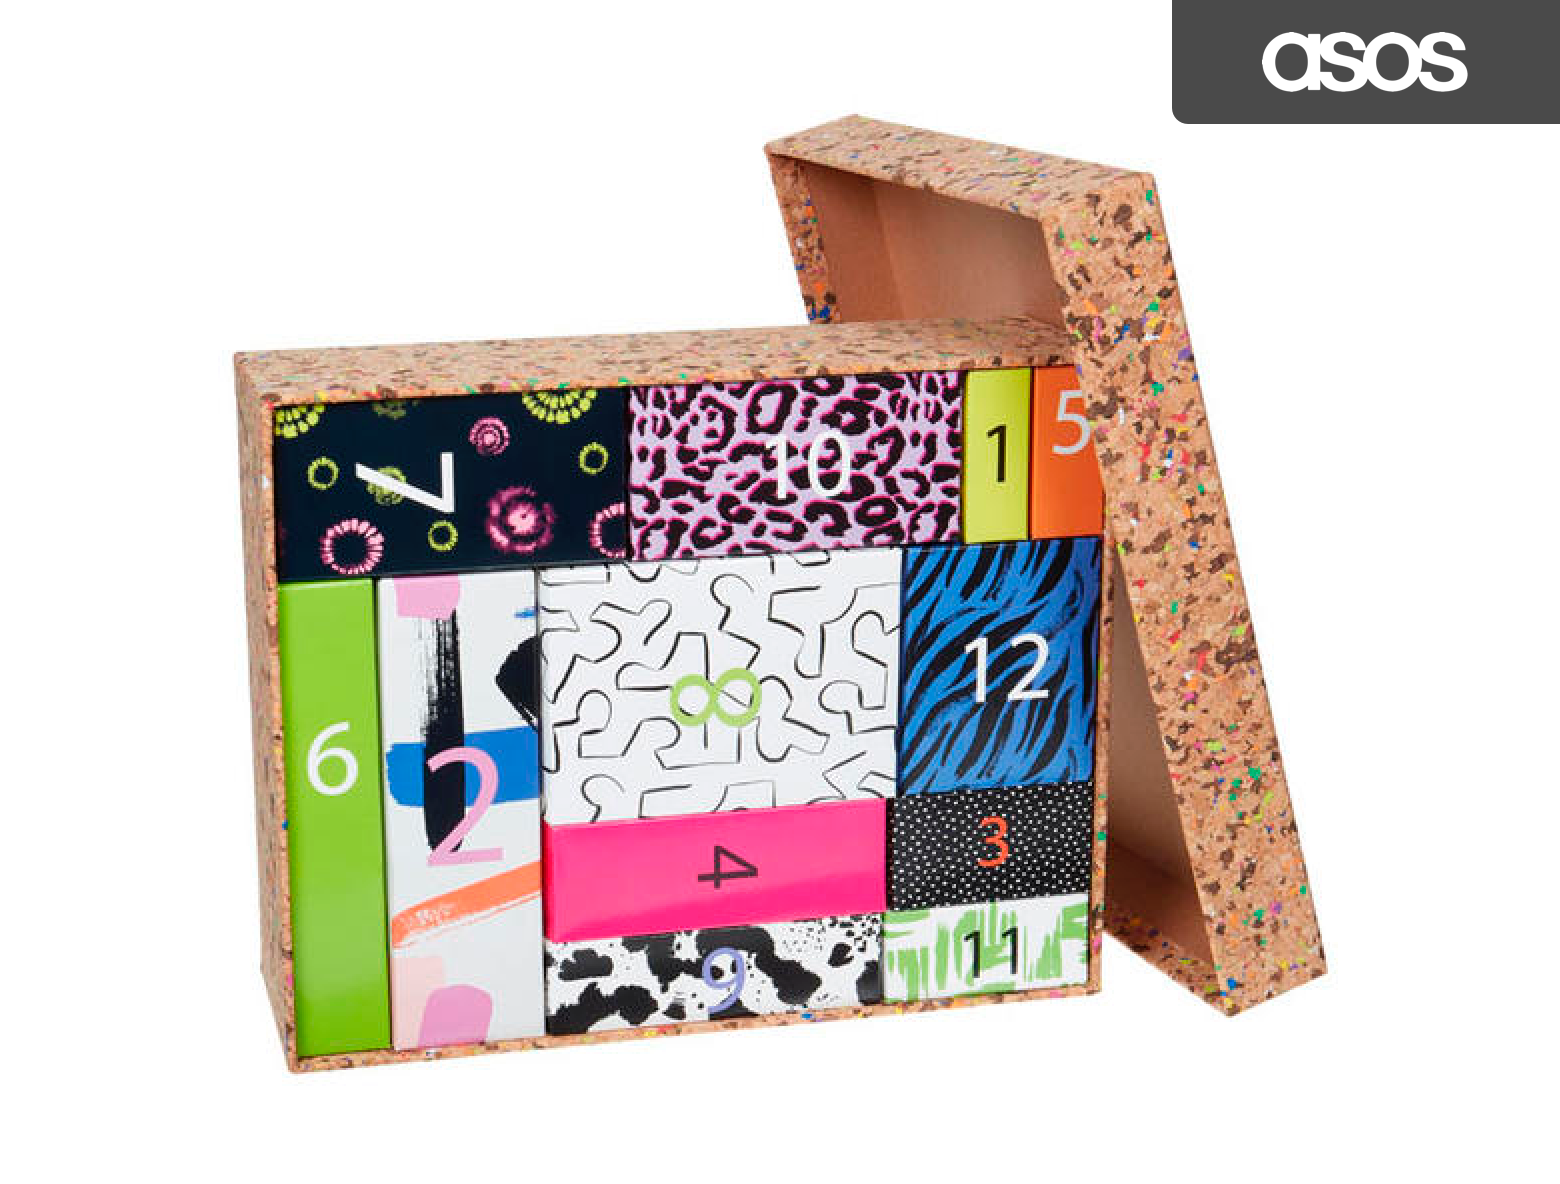 Advent Calendar Box | ASOS